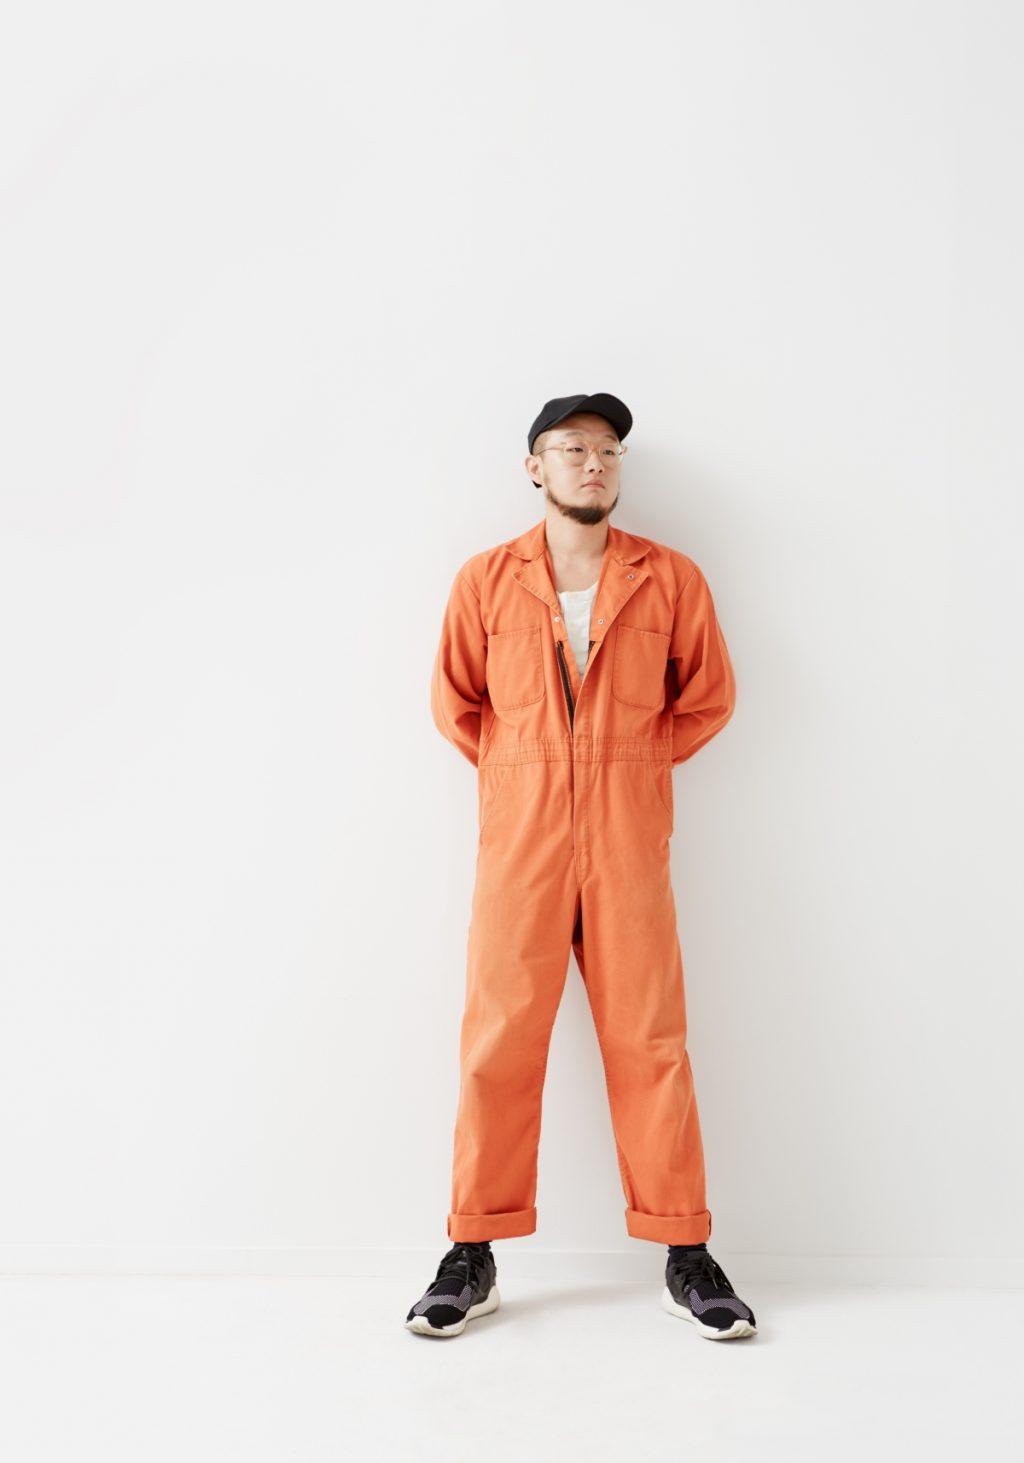 KwanghoLee pa Mok Jinwoo